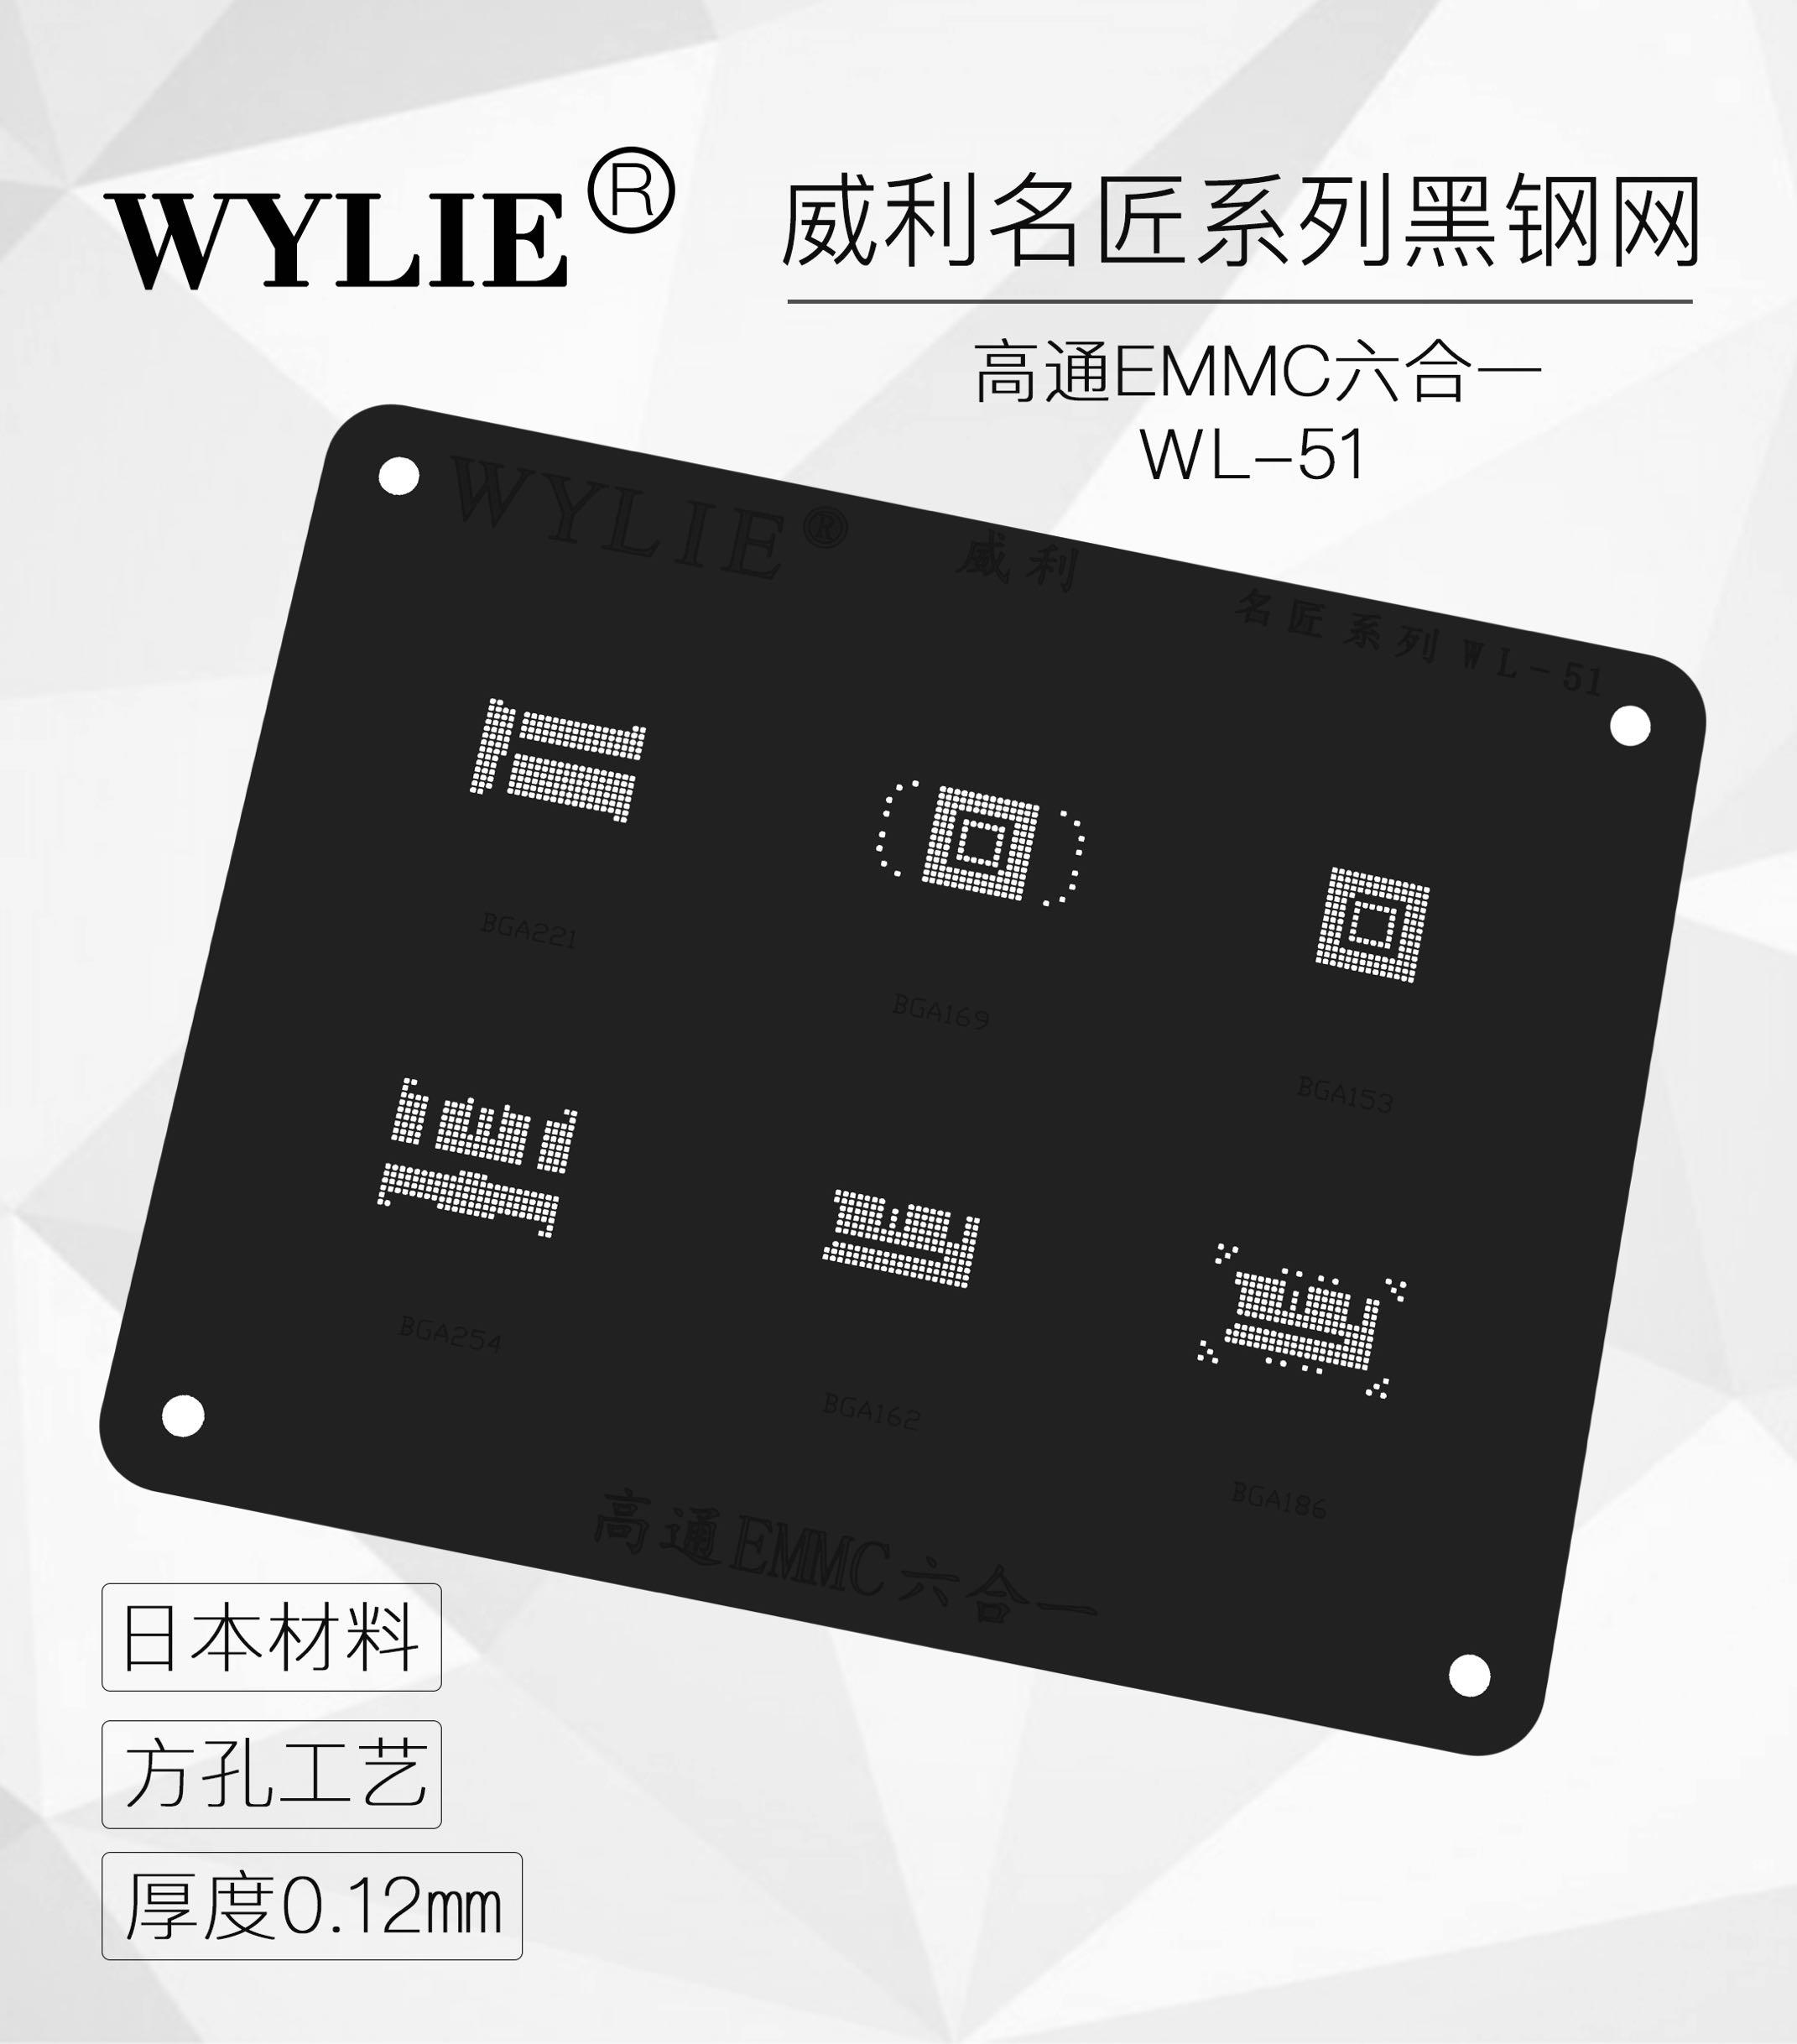 Wylie BGA Reballing Stencil FOR EMMC IC BGA221 BGA153 BGA169 BGA254 BGA162 BGA186 1